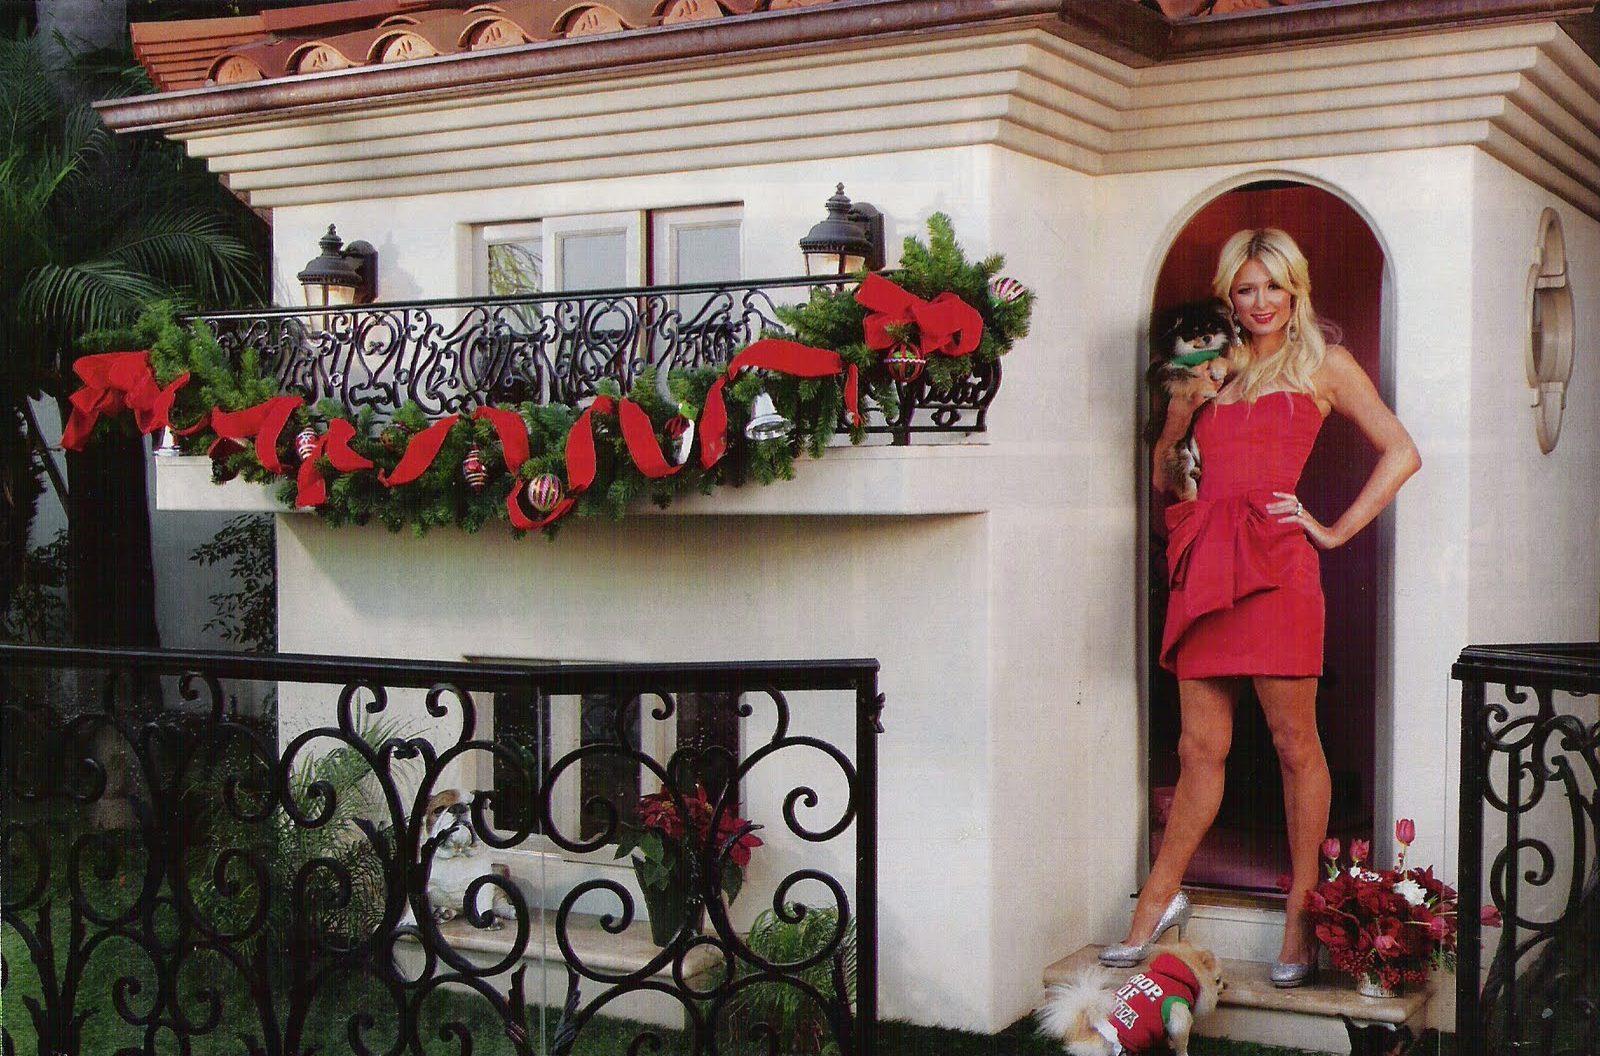 Paris Hilton Dog House